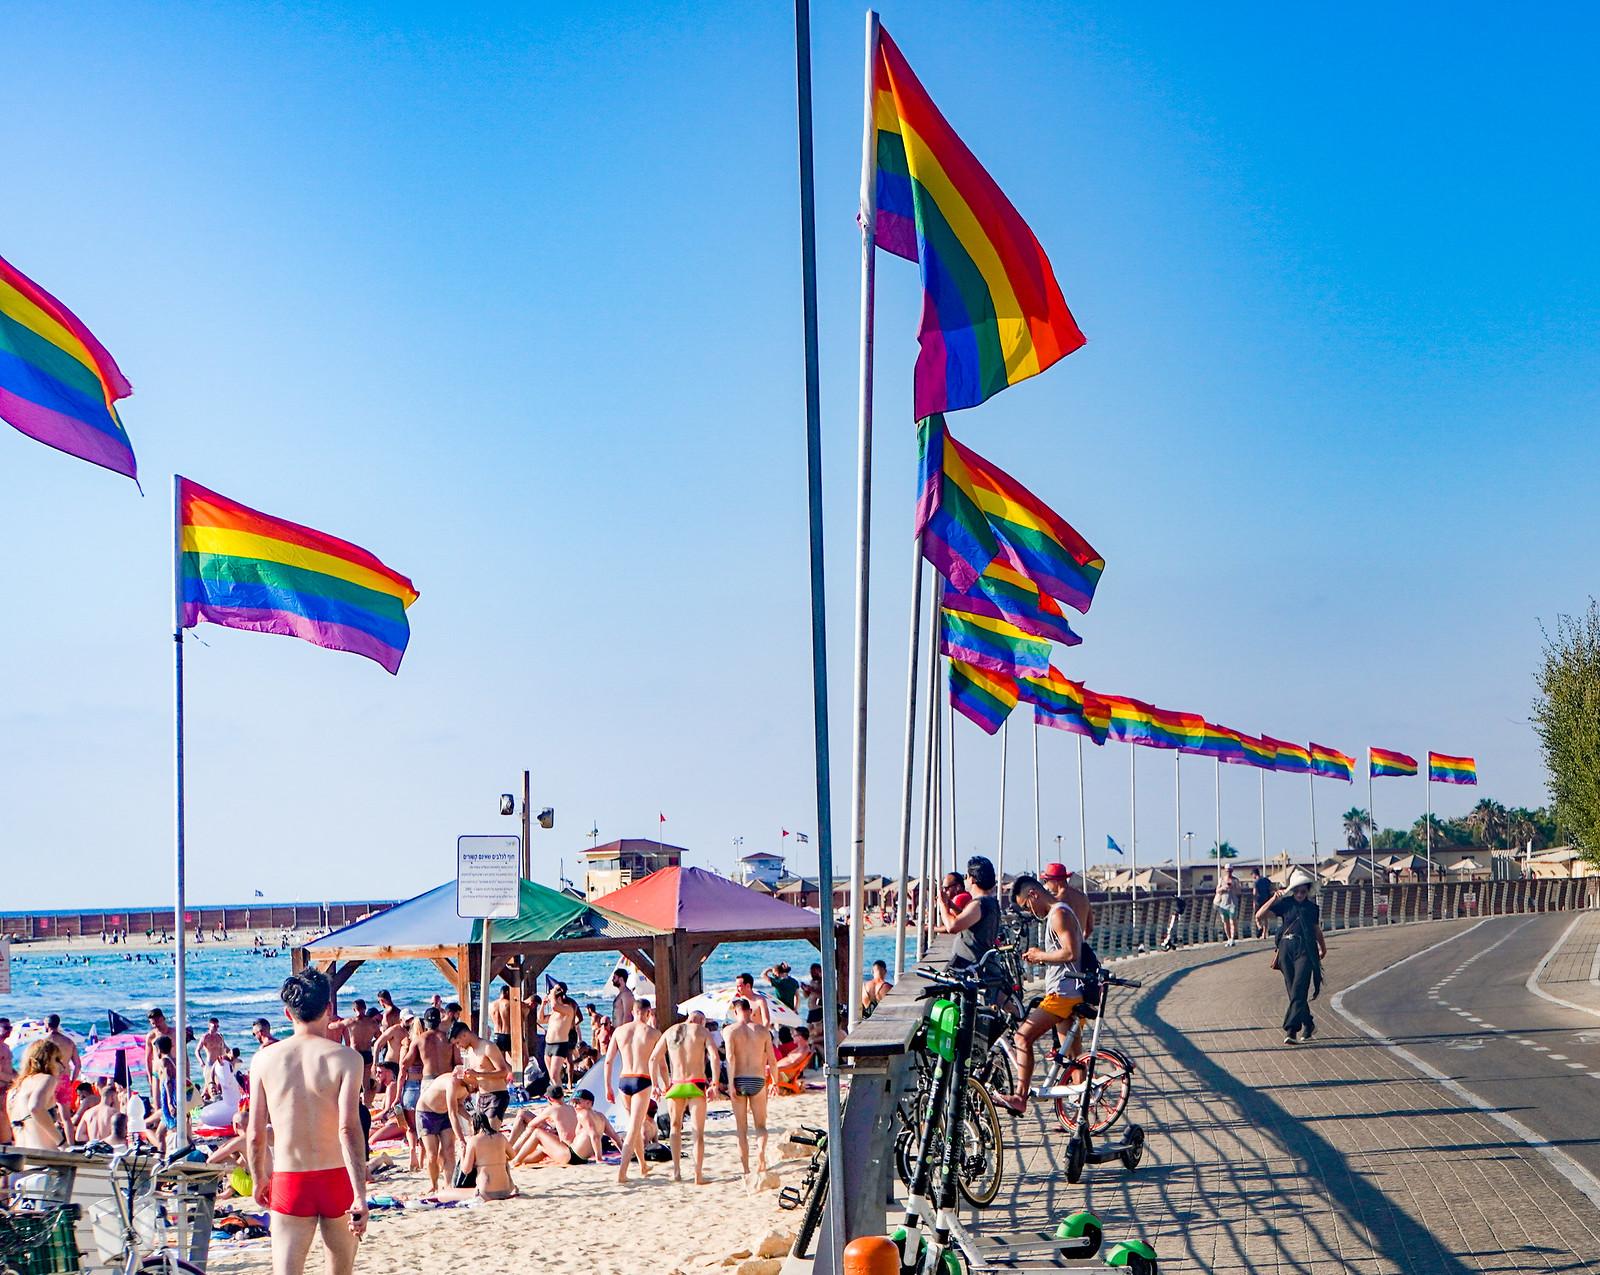 2019.06.13 Hilton Beach at Tel Aviv Pride, Tel Aviv Israel 1640020